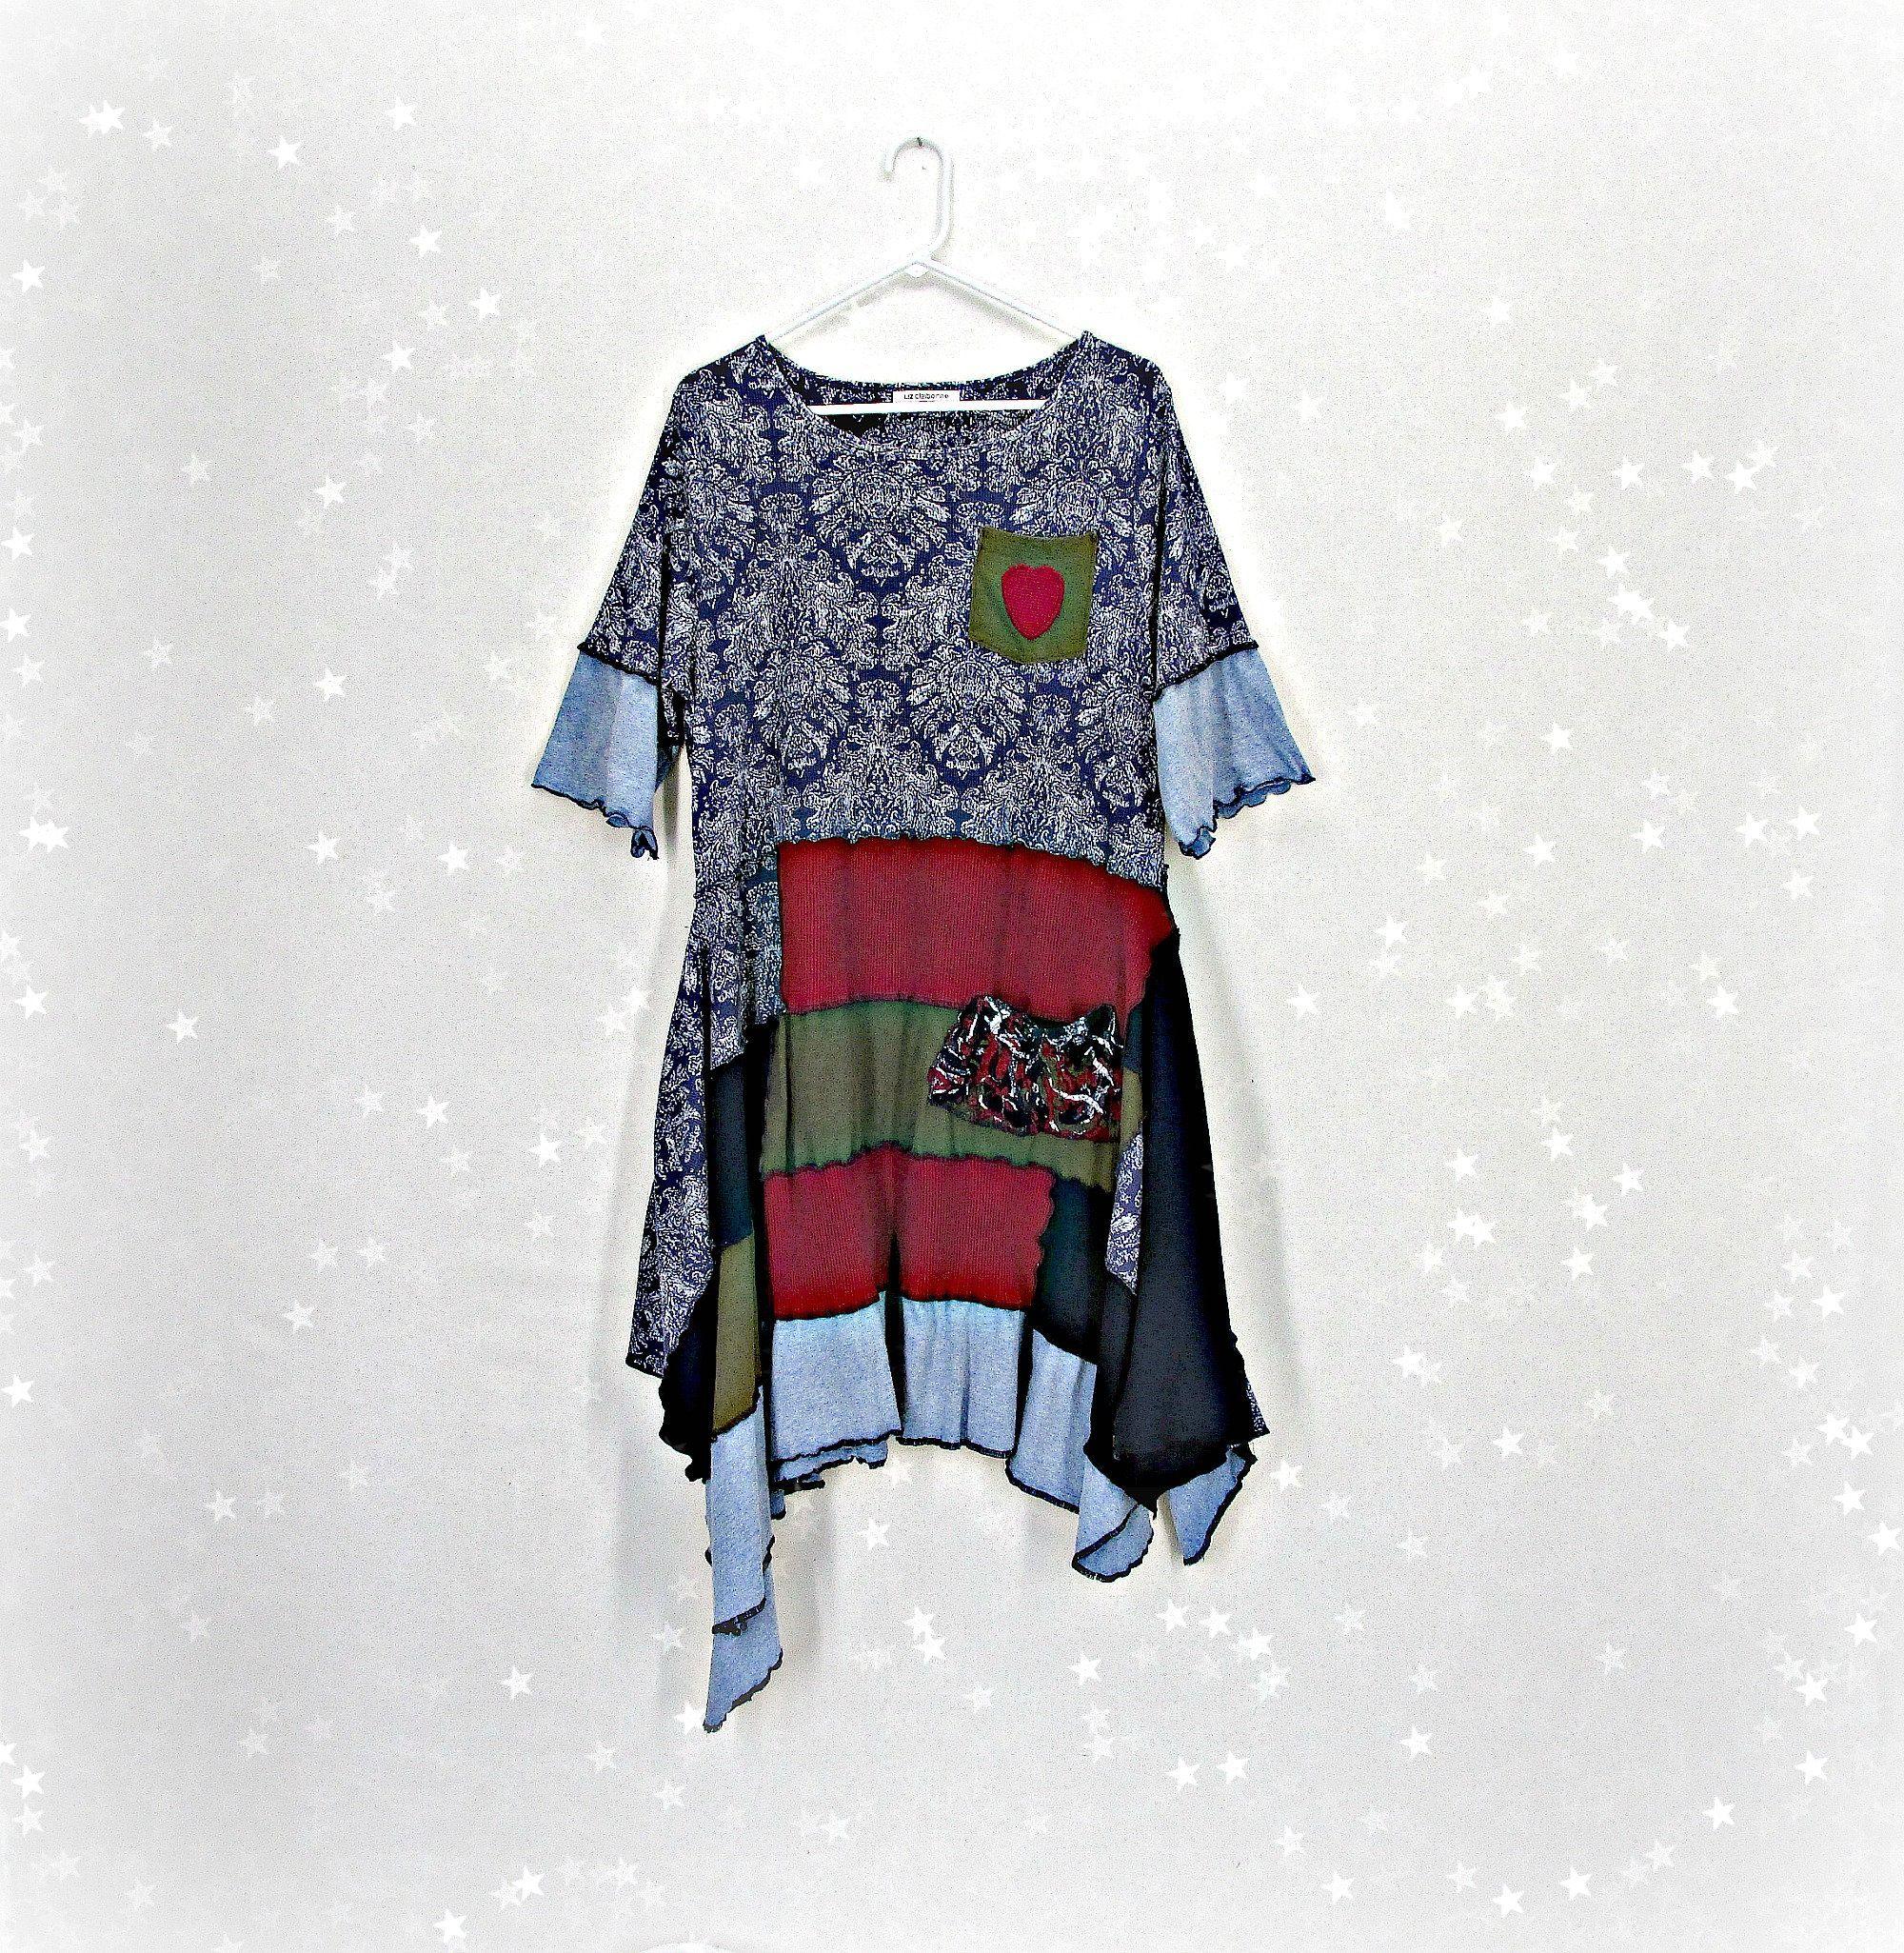 Rainbow dress tunic Upcycle tunic tops for women Upcycle tshirt dress Lagenlook clothing Bohemian dress Boho clothing plus size Hippie shirt